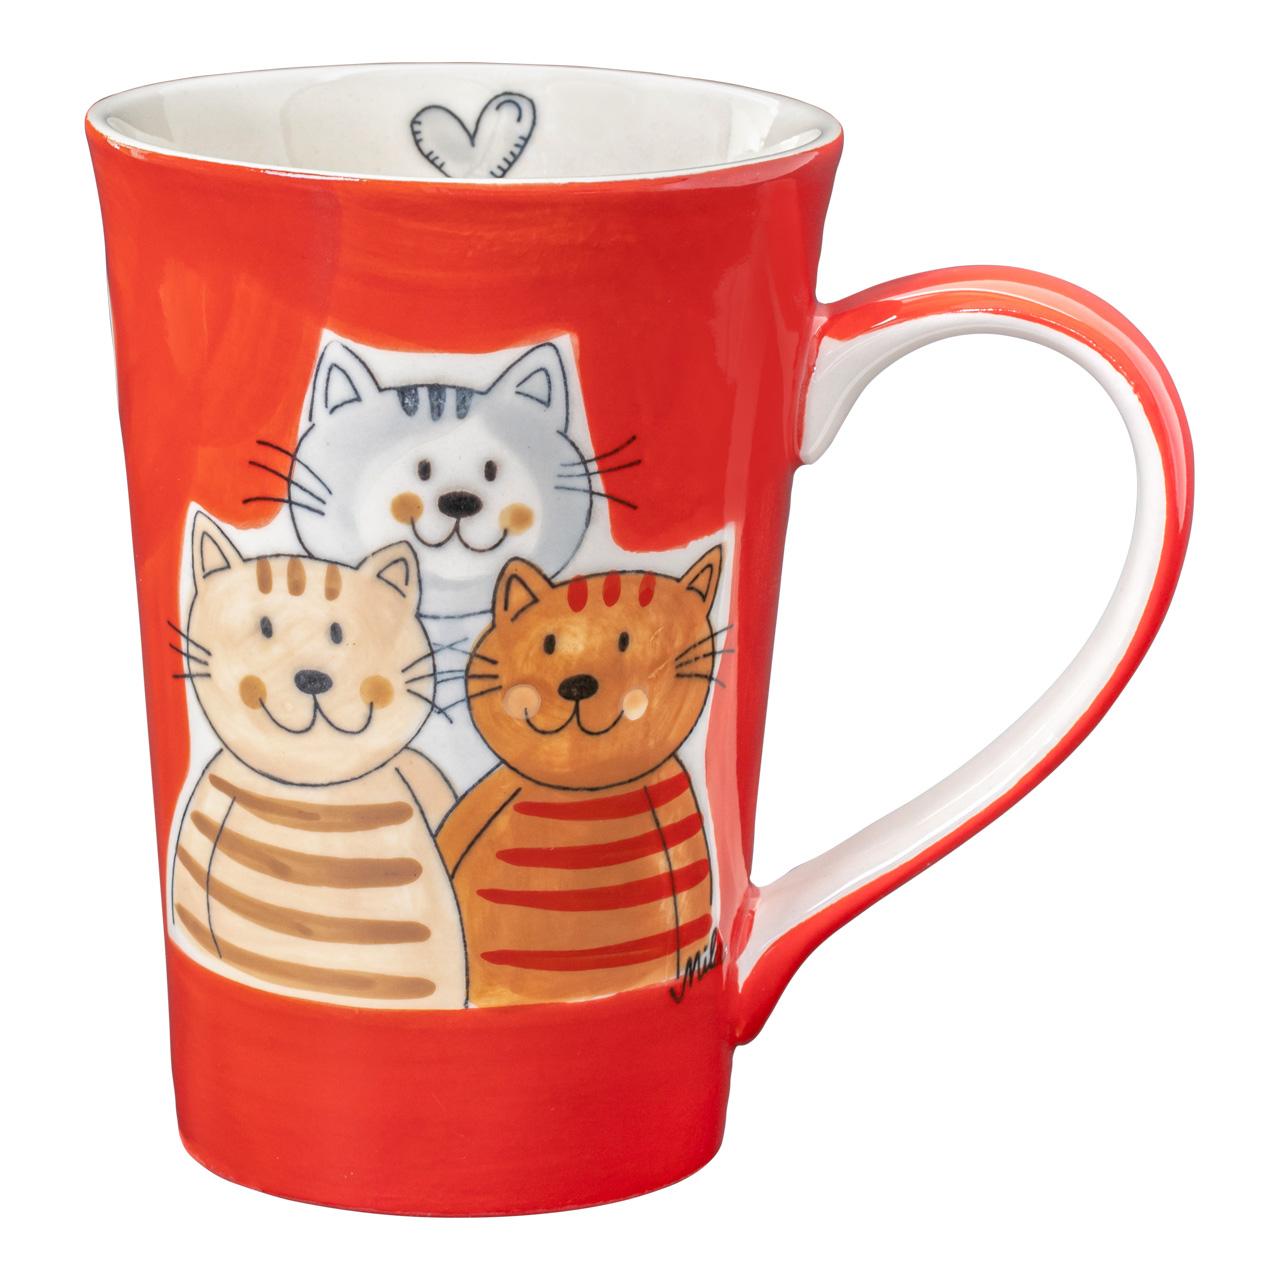 Teebecher - Cuddly Cats